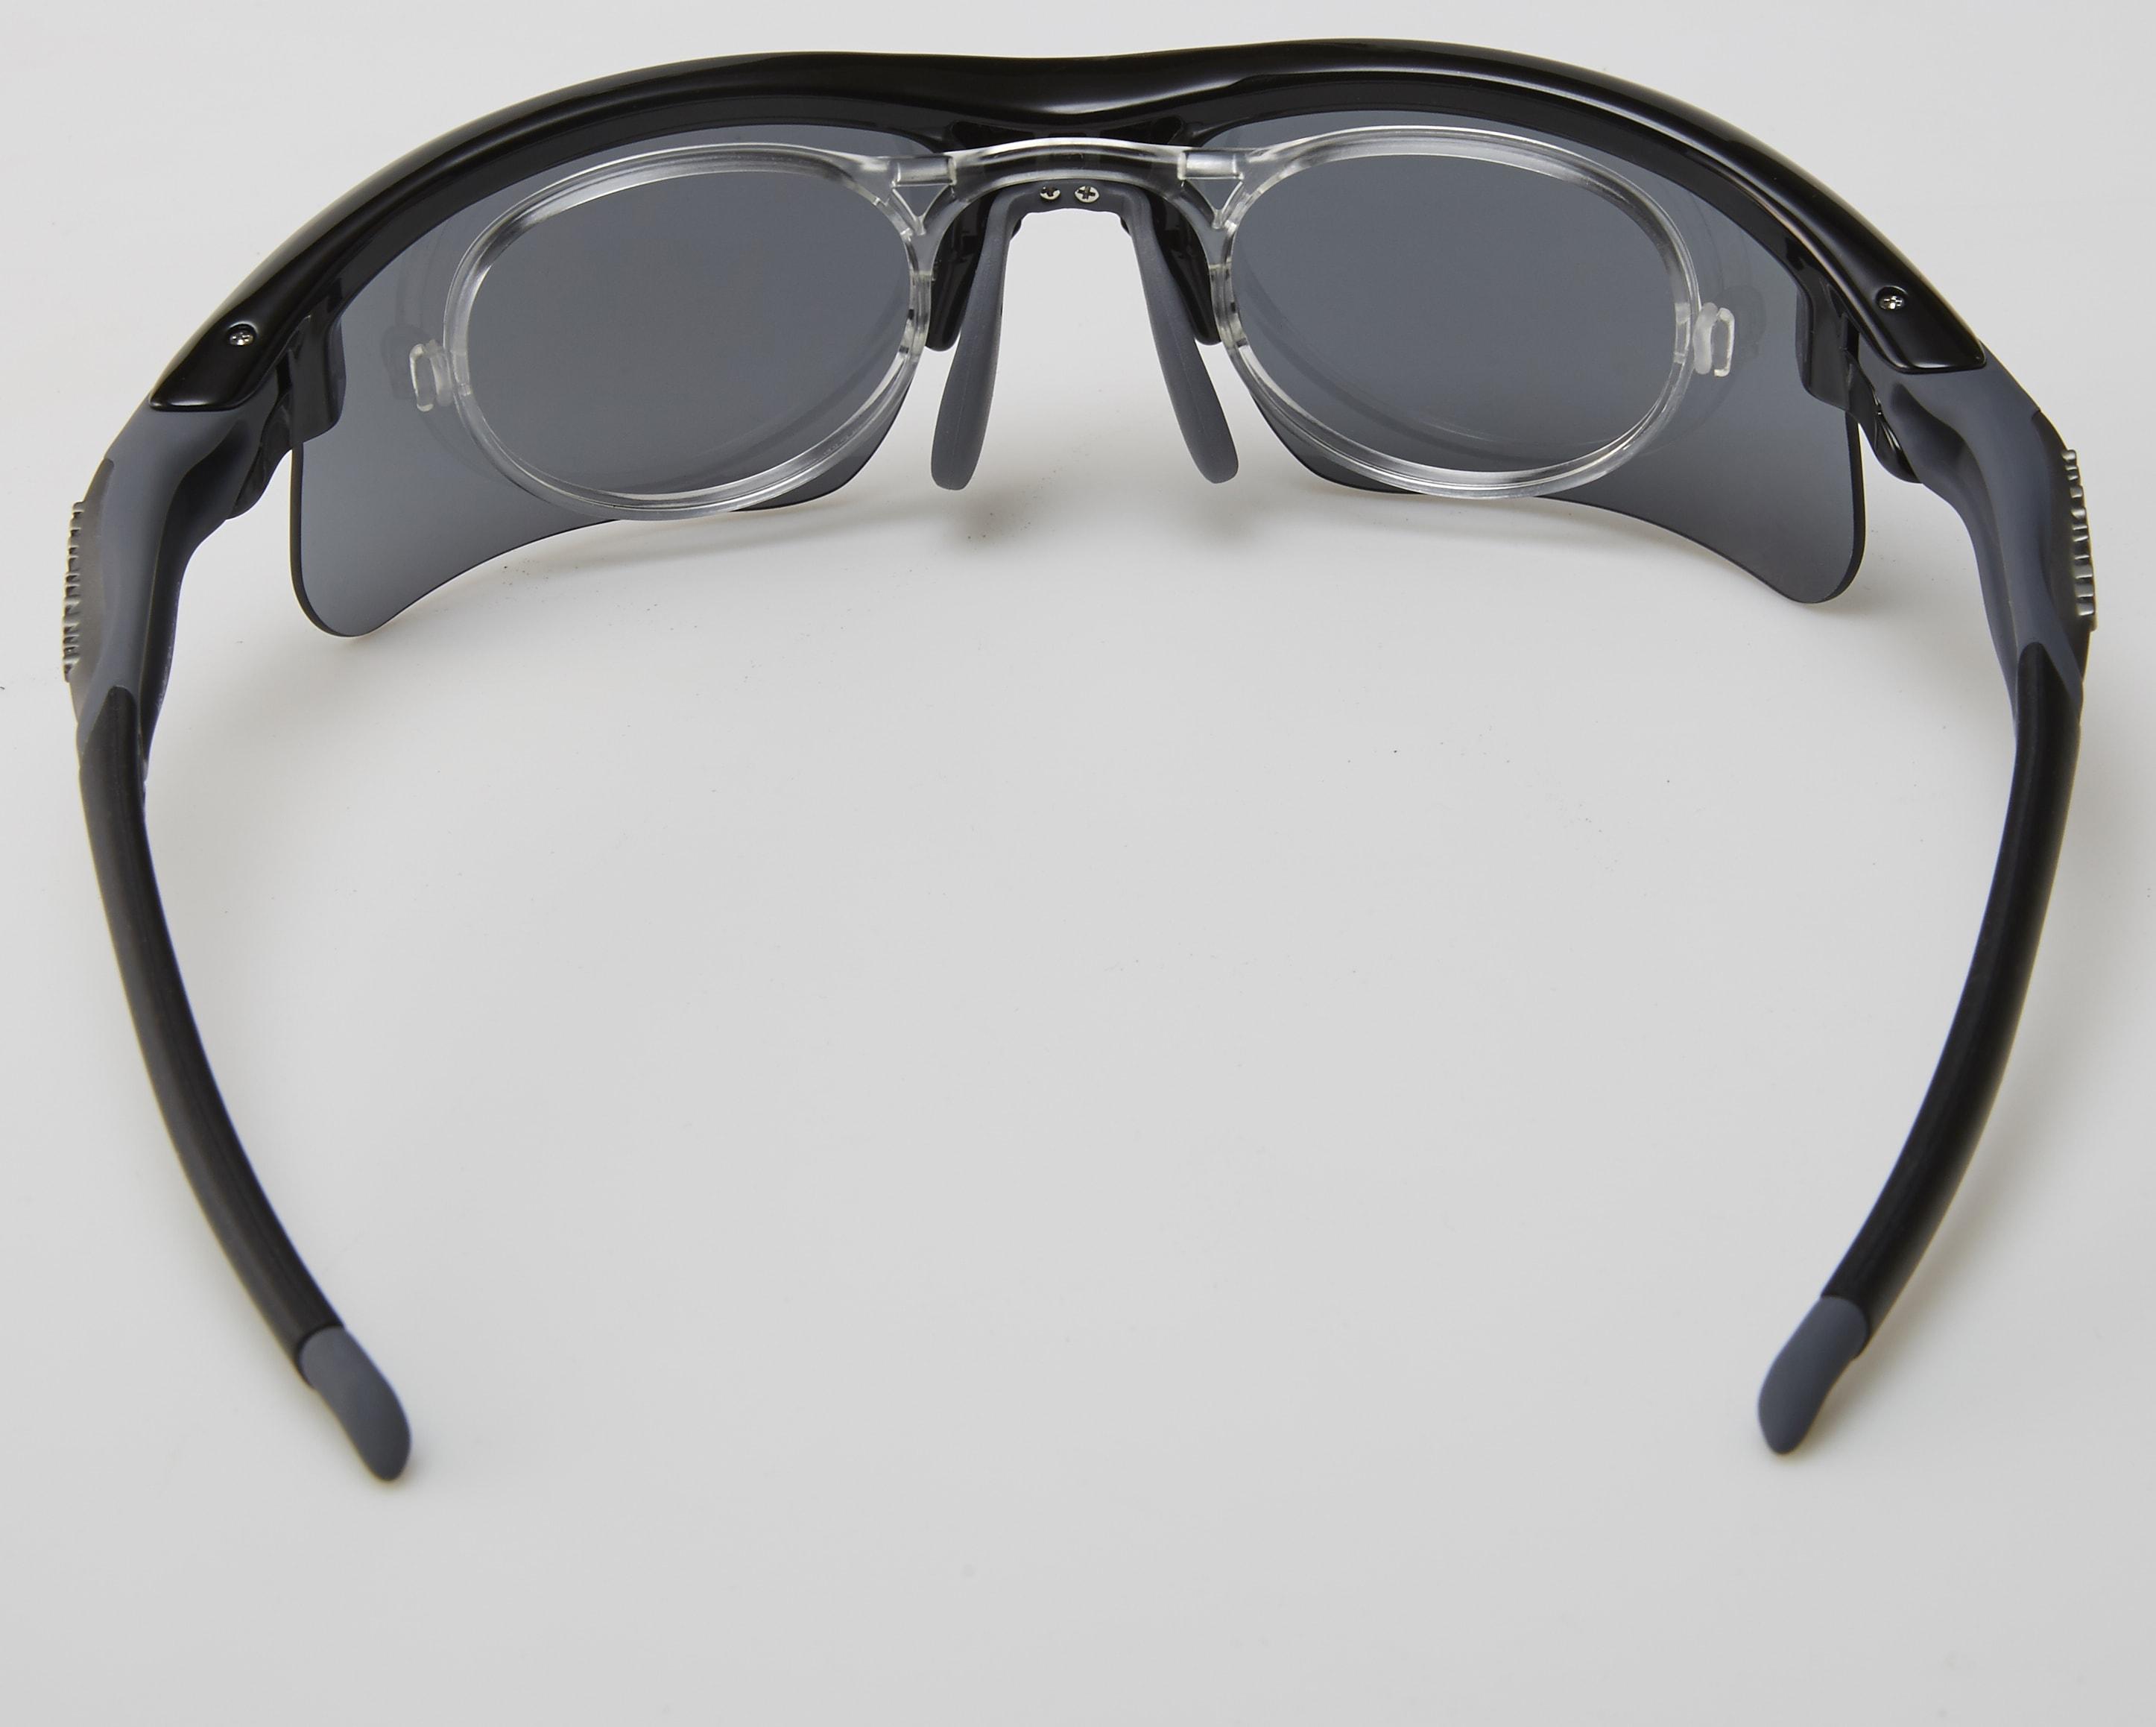 clip optico feel morys ms-047 negra